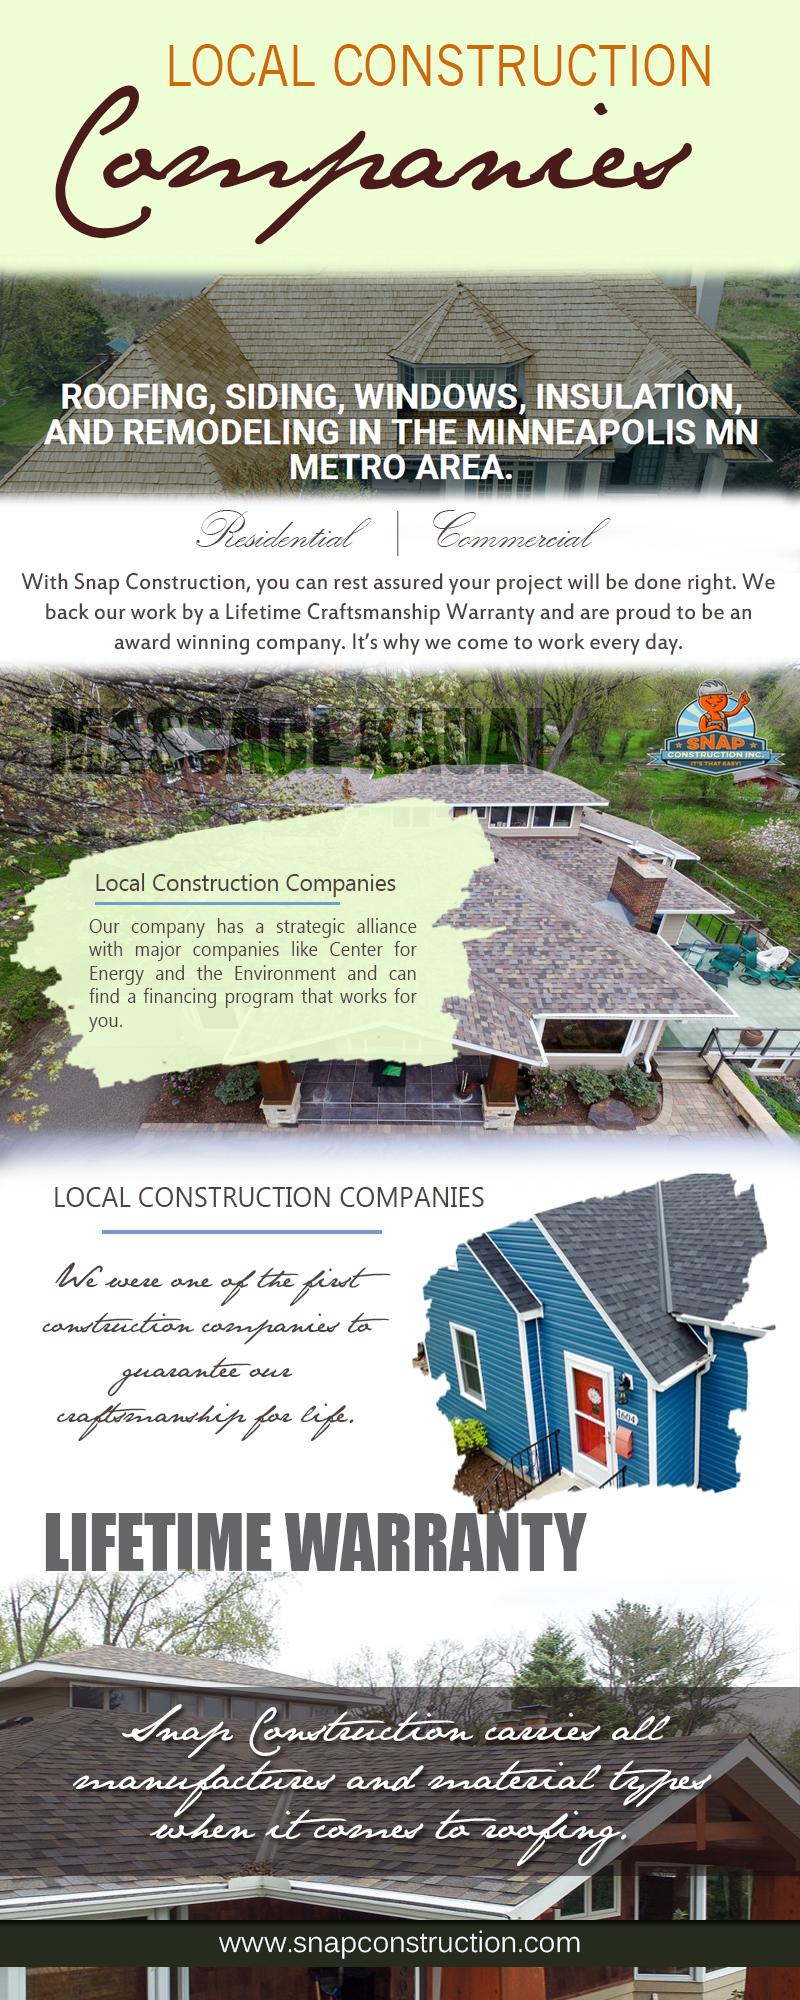 Local Construction Companies - Snap Construction